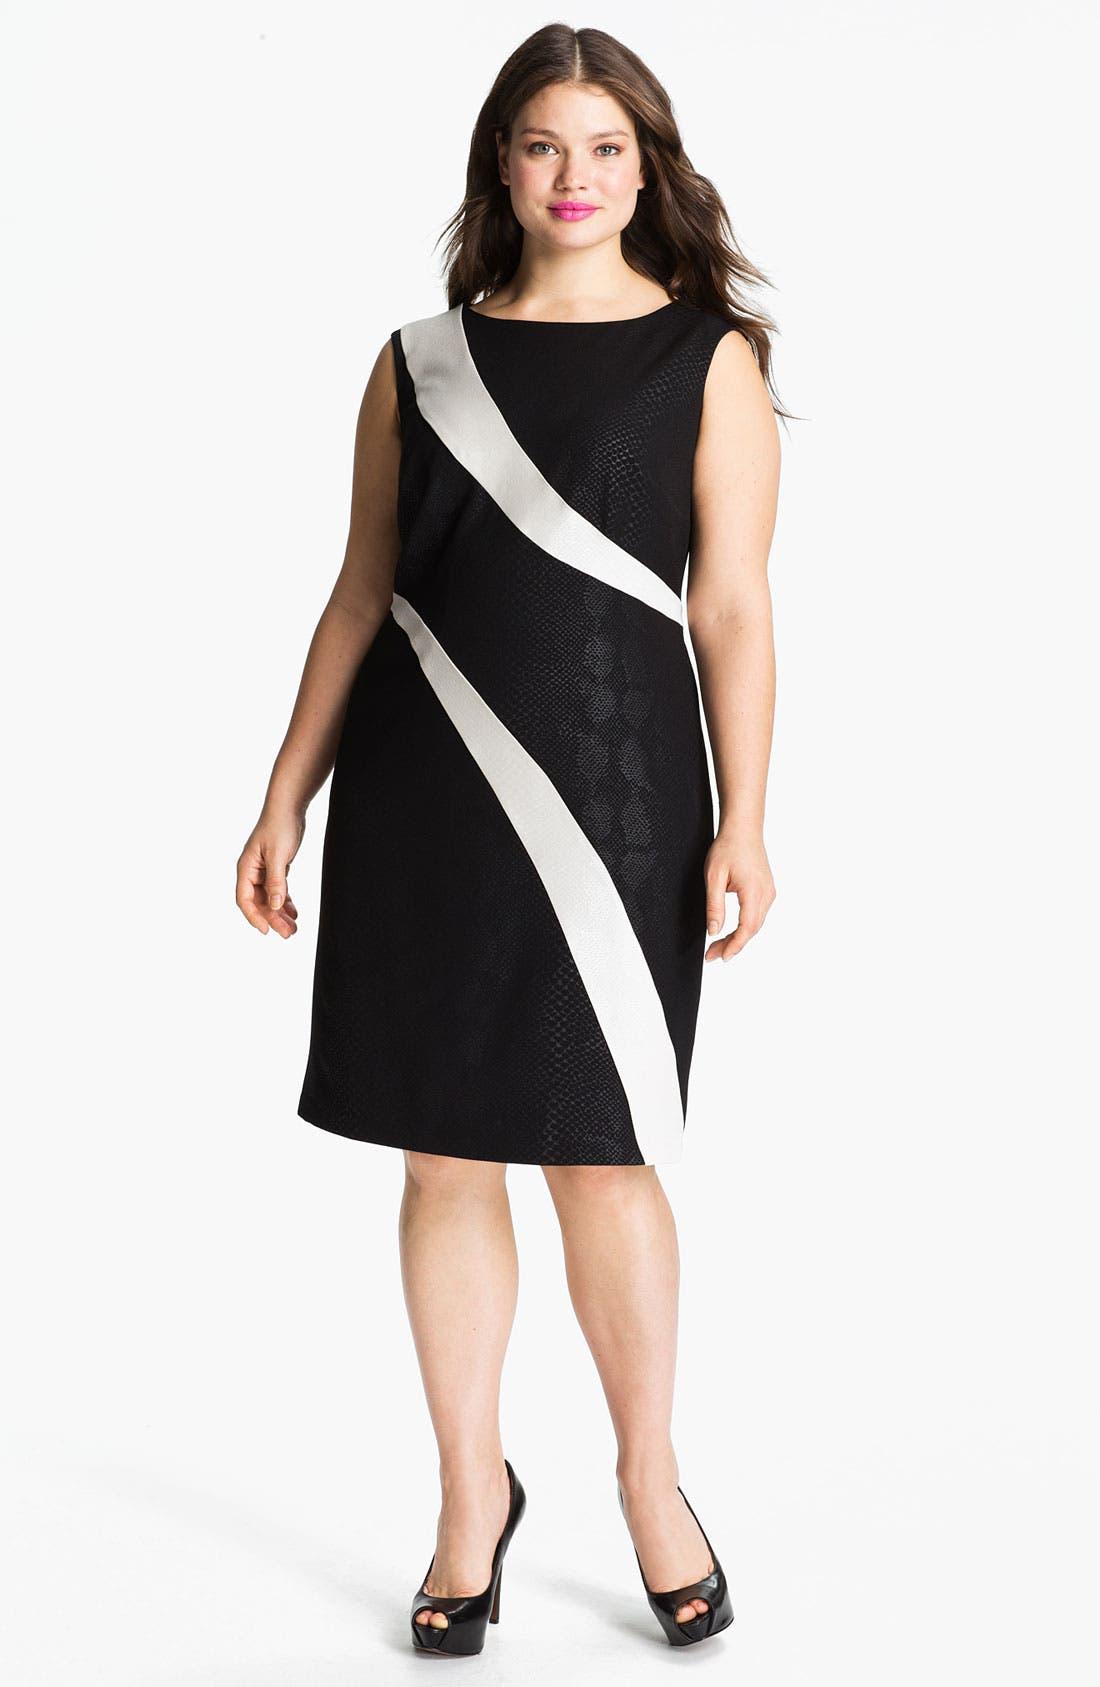 Alternate Image 1 Selected - Adrianna Papell Contrast Panel Snakeskin Pattern Sheath Dress (Plus)